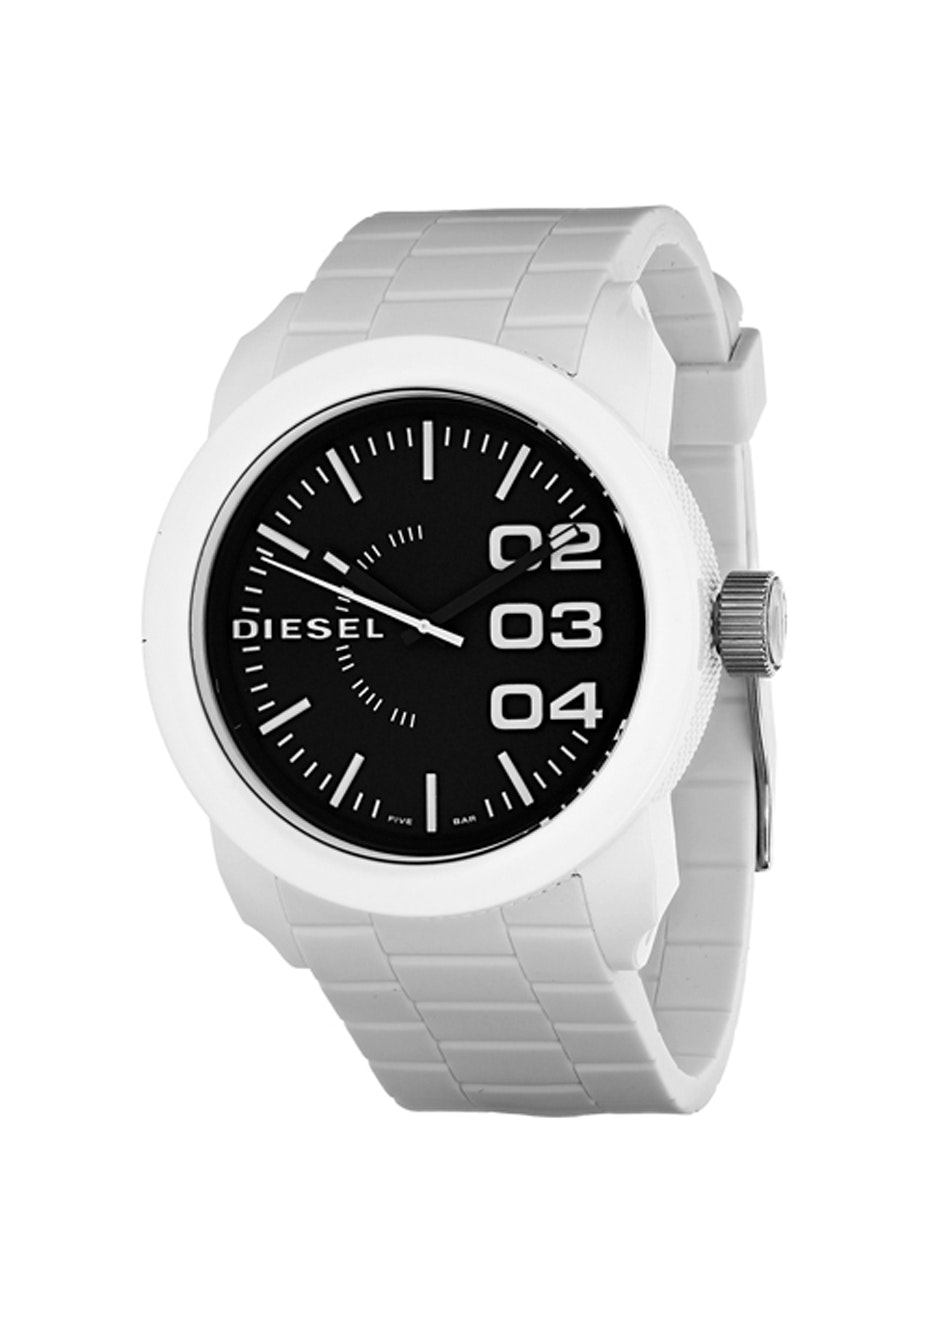 Diesel Men's Double Down - Black/White